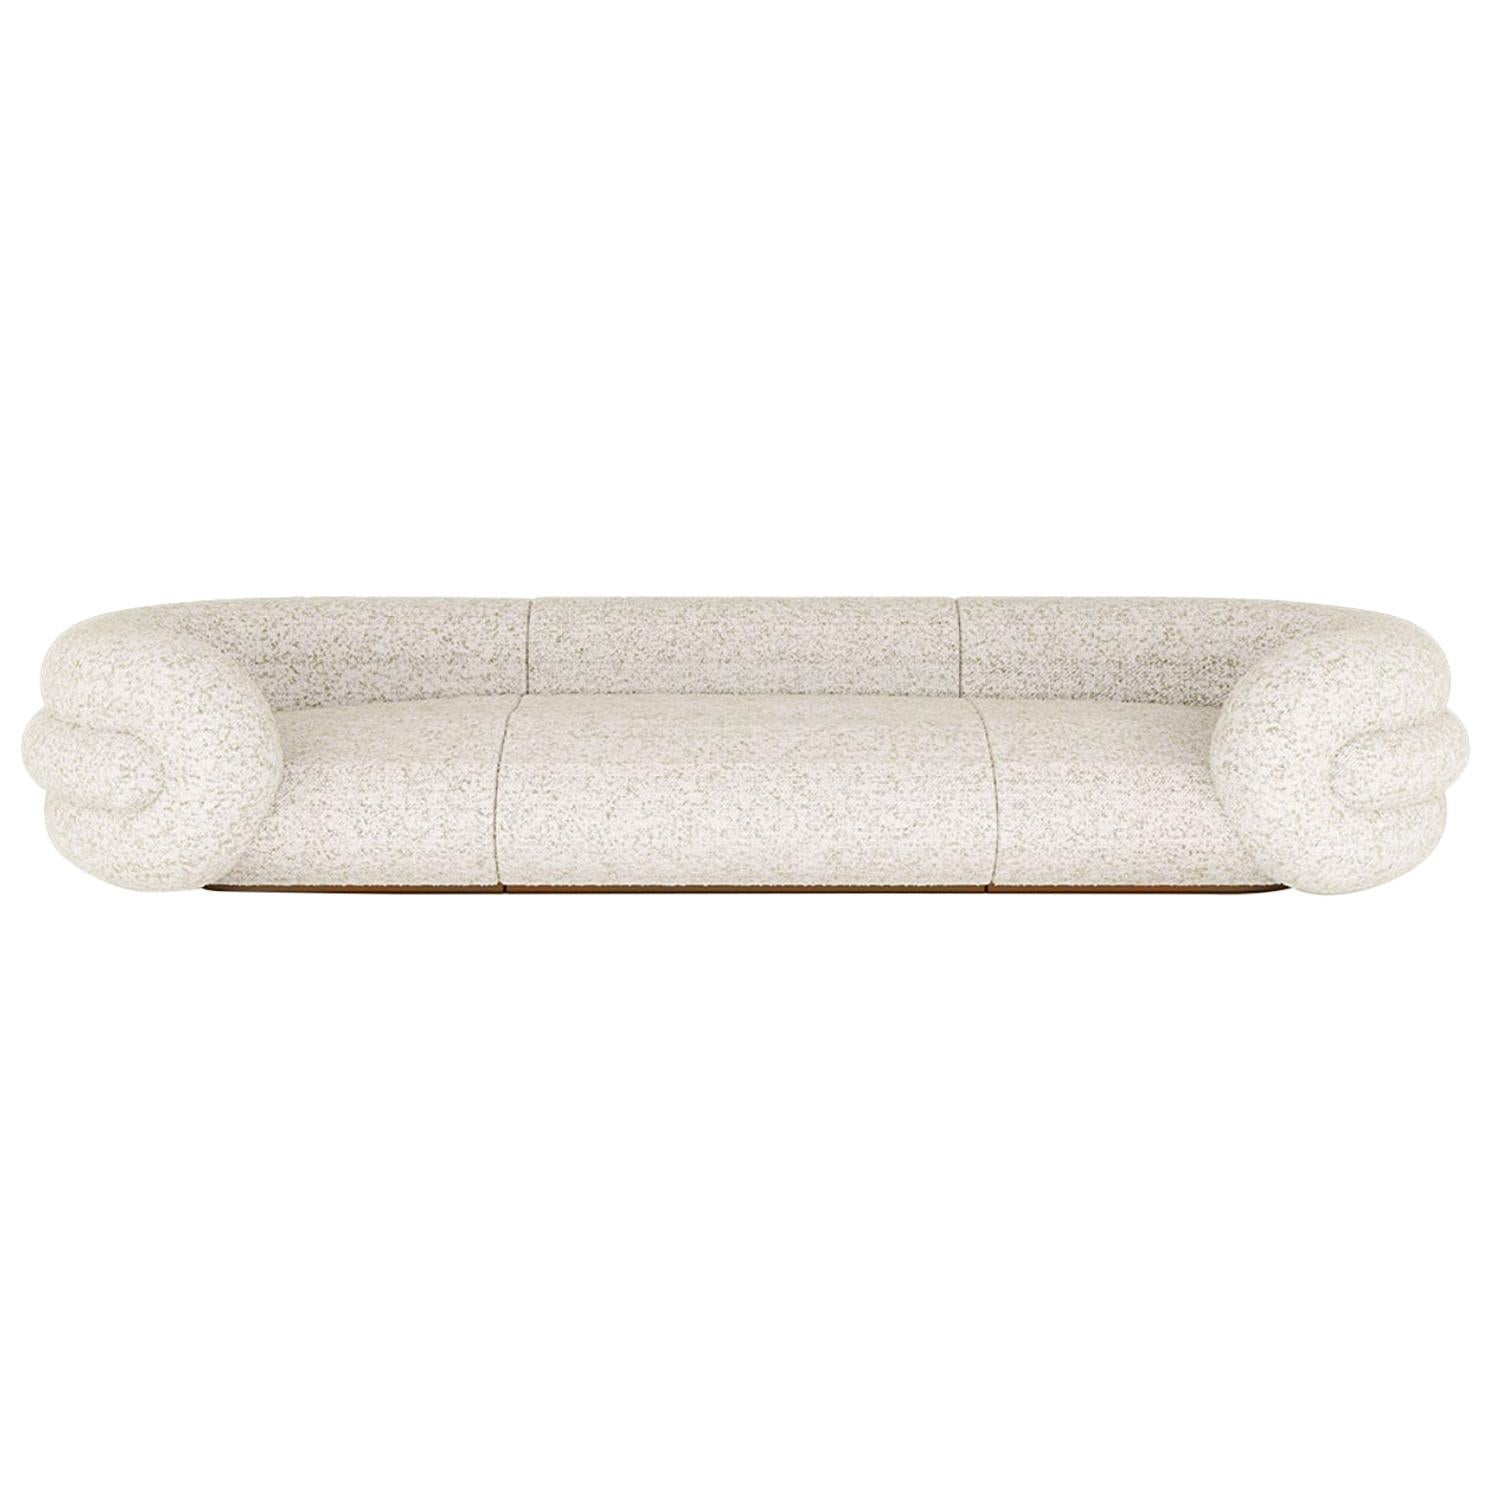 Gommosa Sofa in Boucle Fabric and Walnut Veneer